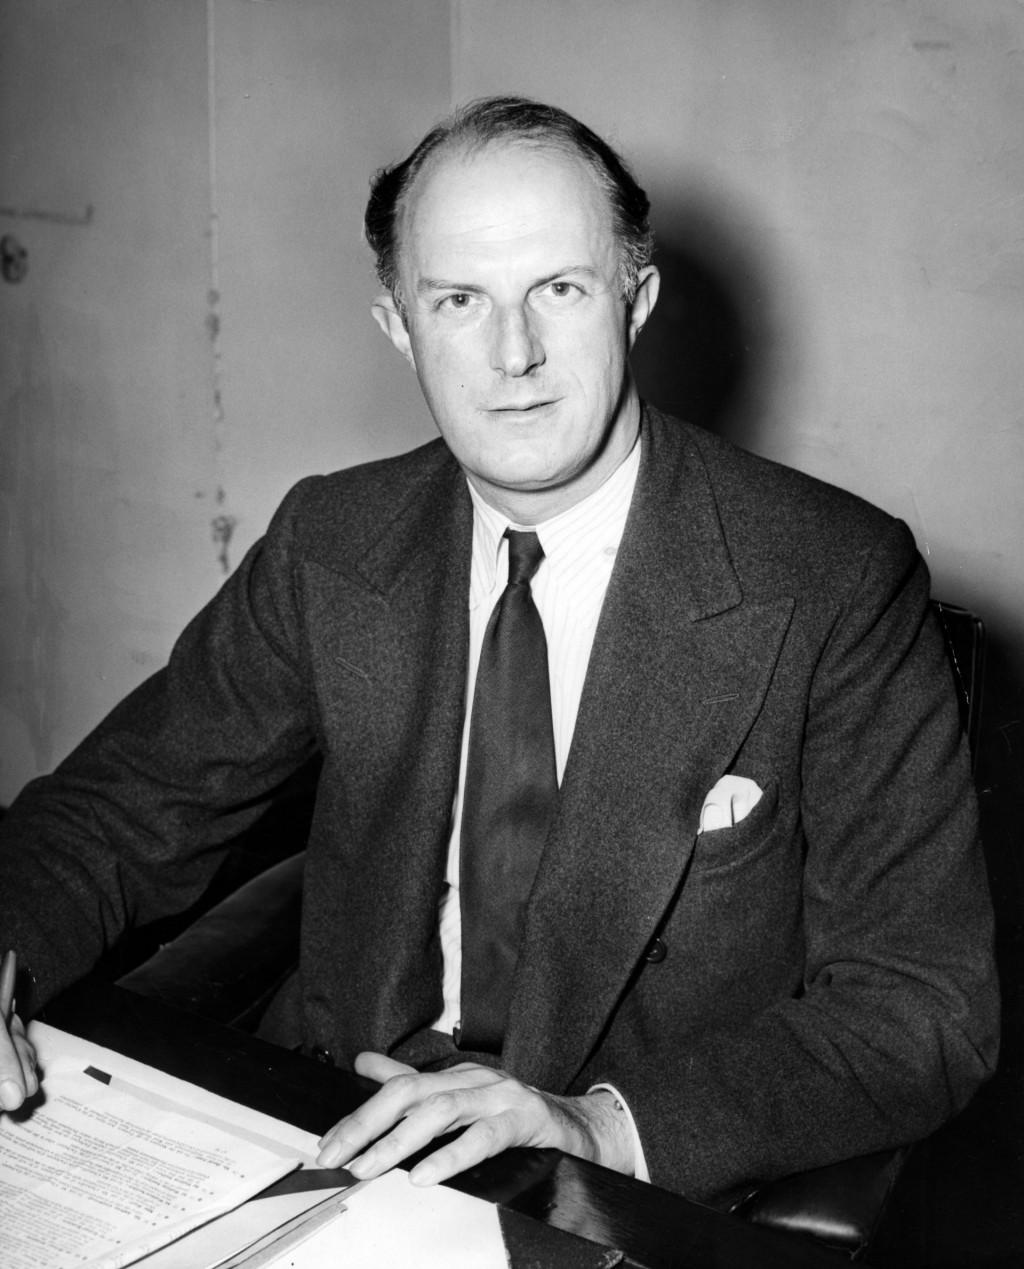 Fitzroy Maclean snimljen 1954. godine